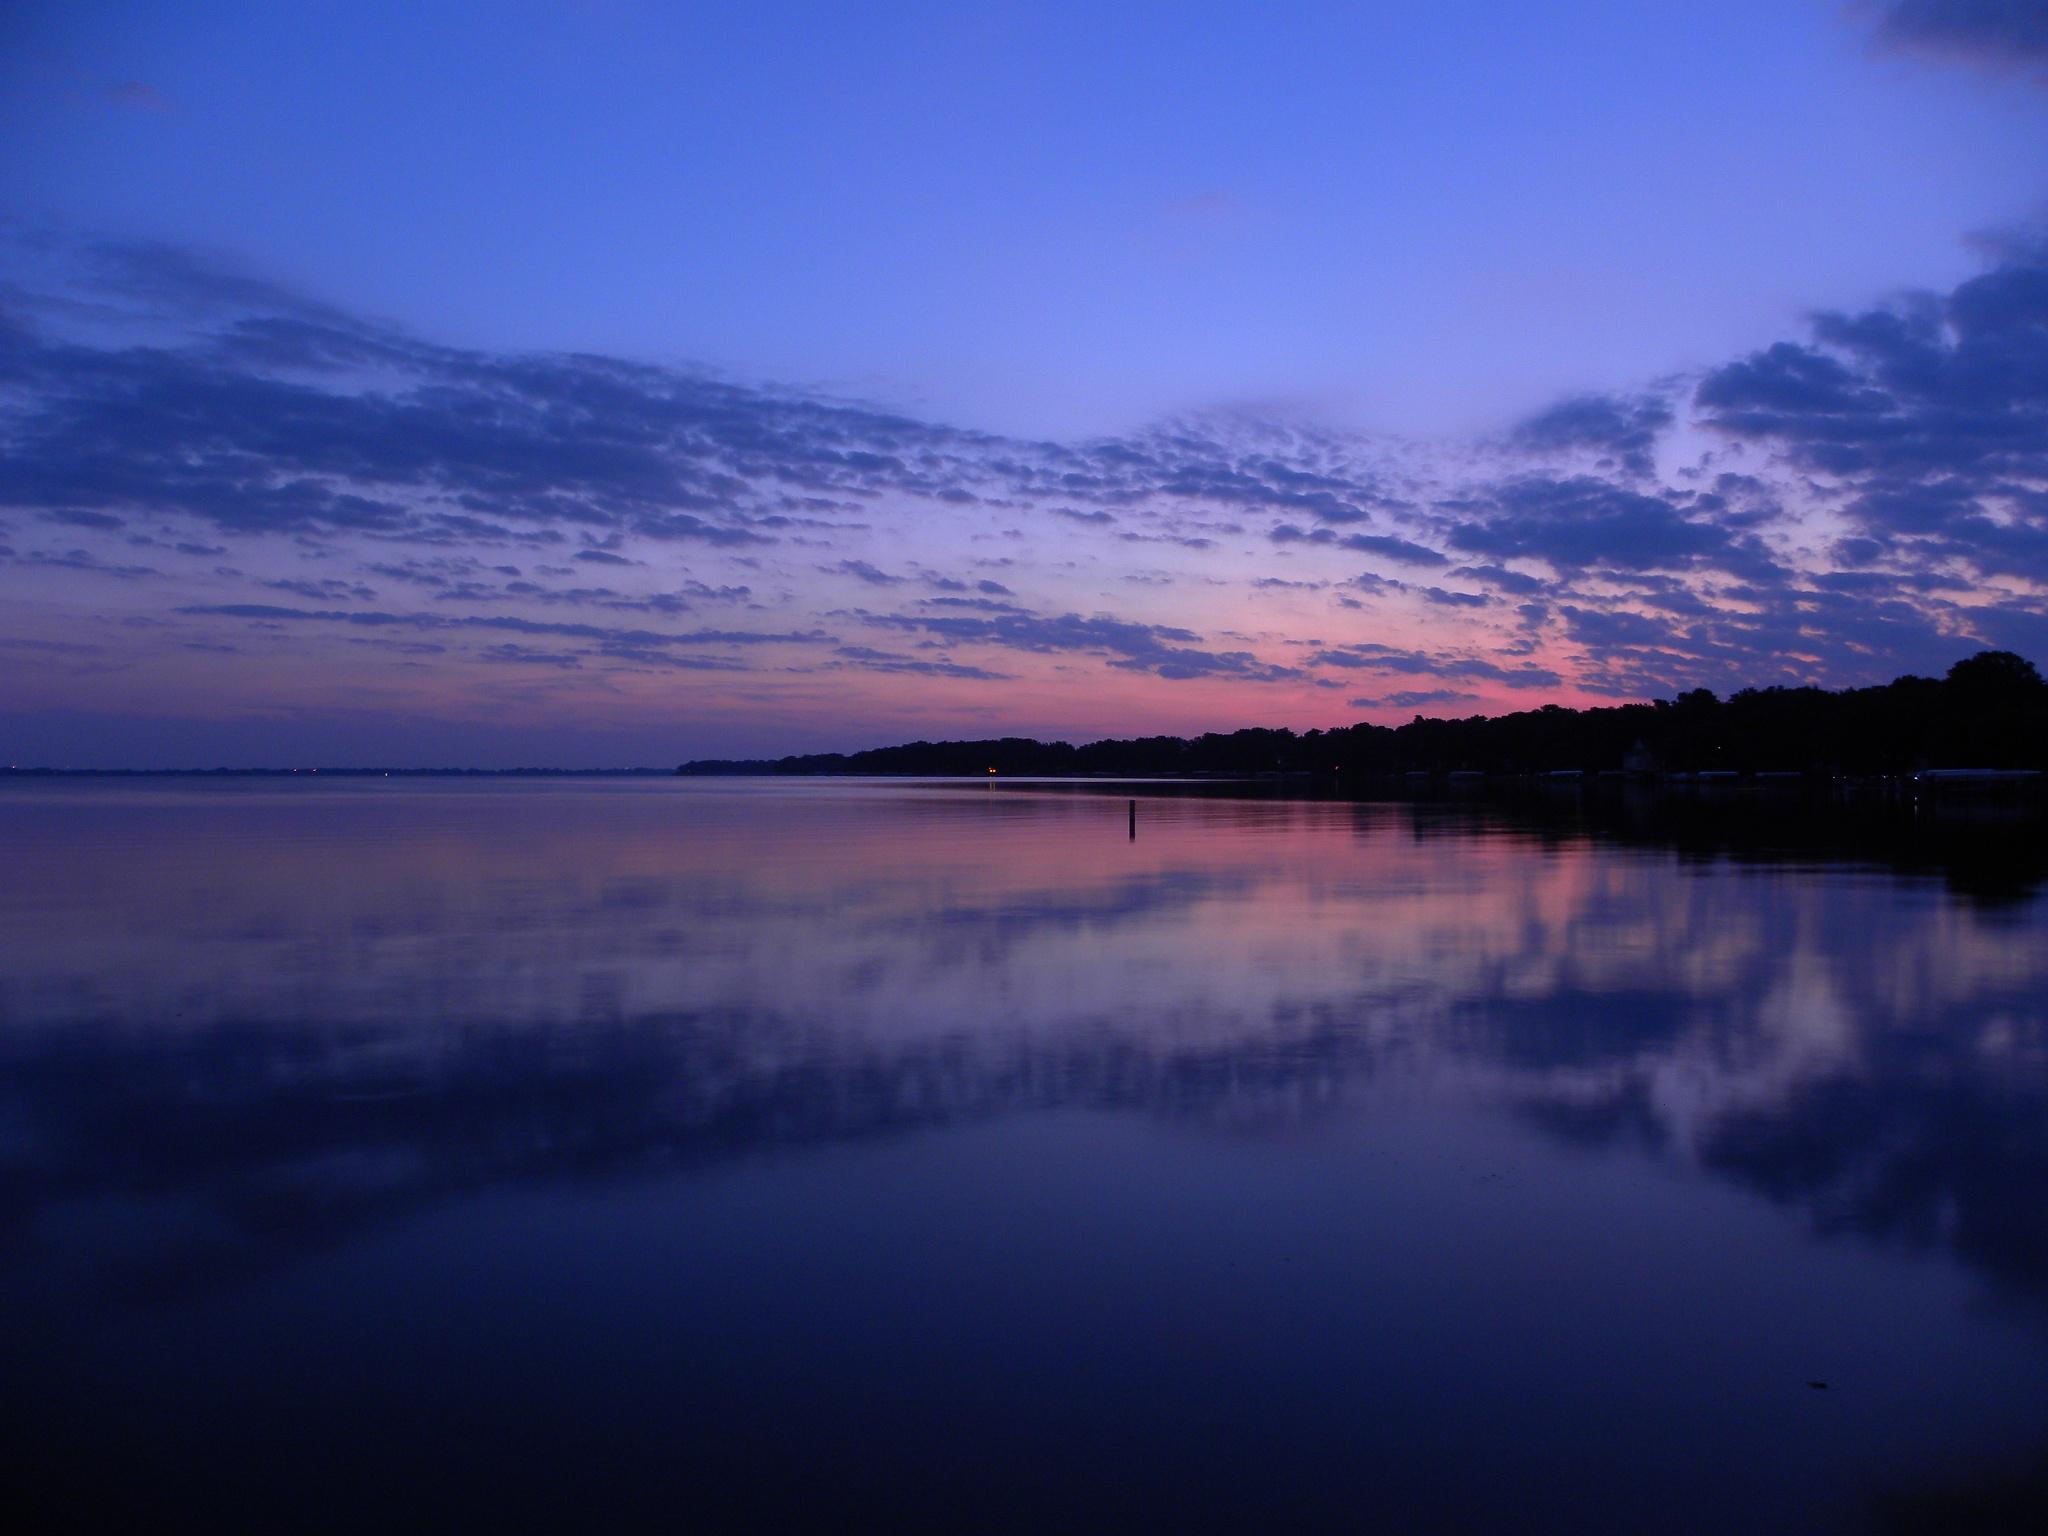 Beautiful Sunrise on Big Spirit Lake in Iowa by Kimberly Ronan